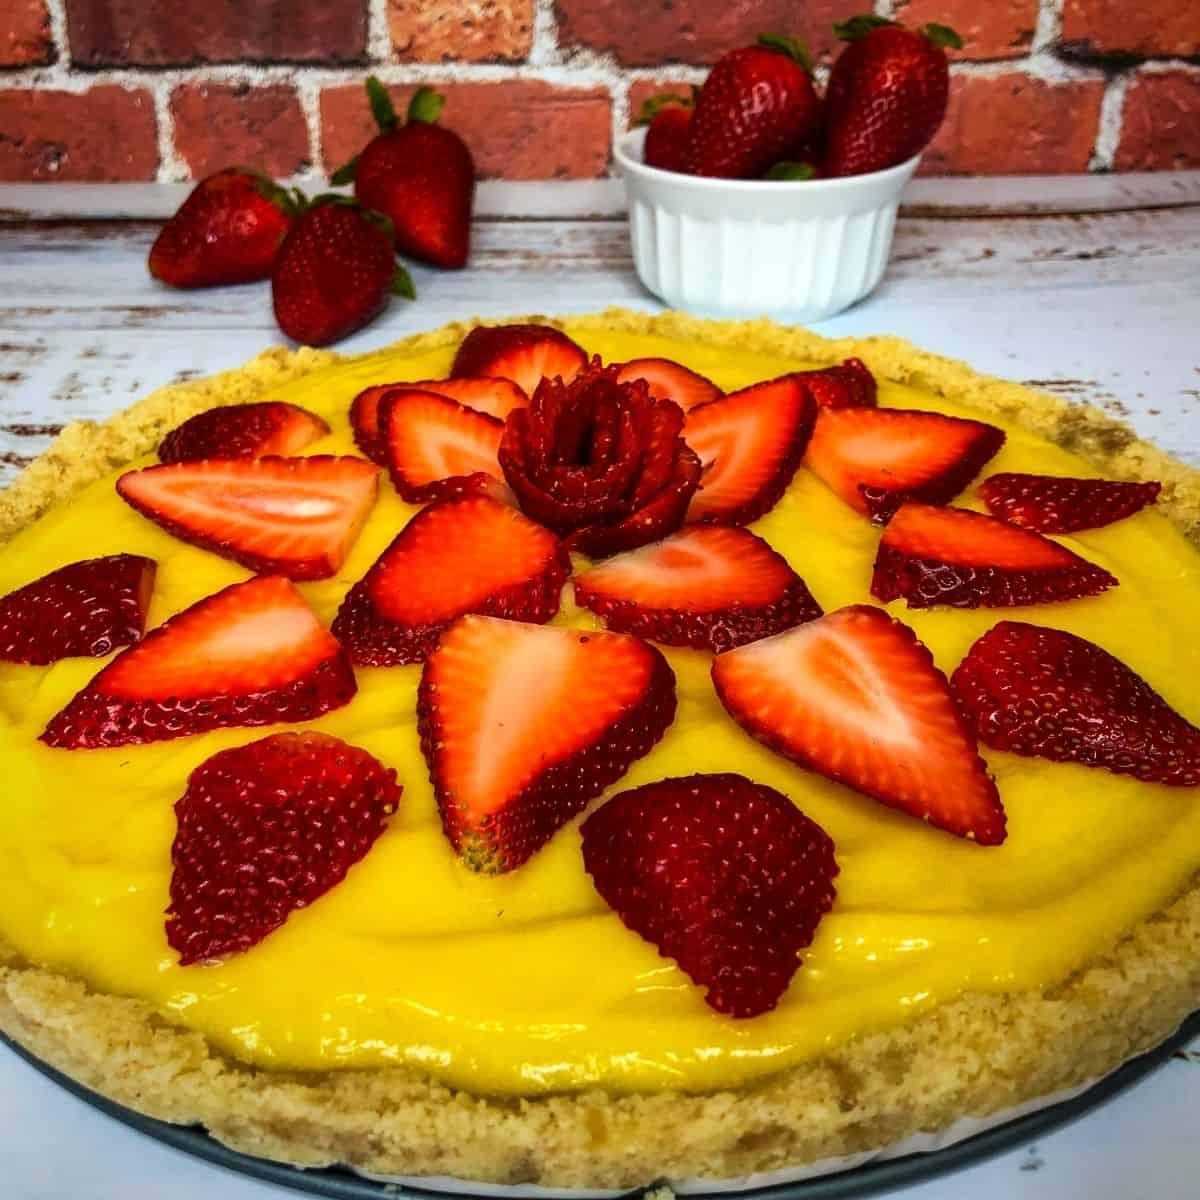 Low Carb Strawberry Lemonade Tart FI